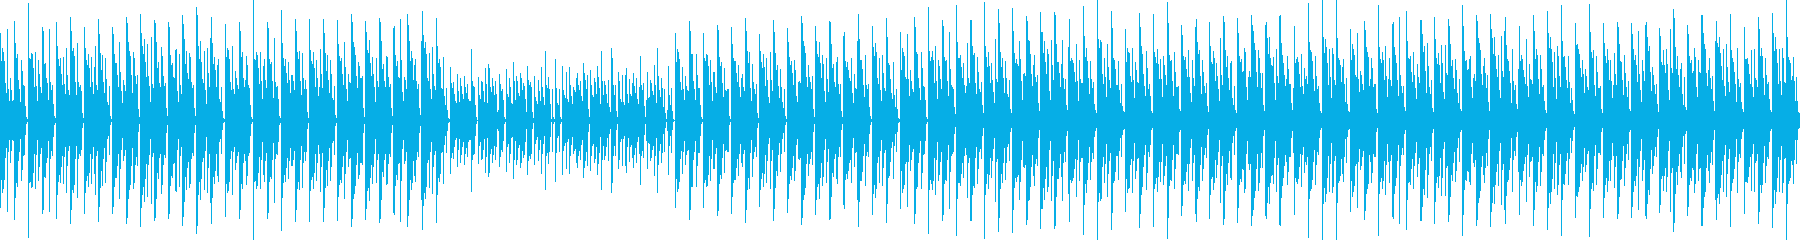 (loop)ミニゲーム風ファンシーポップの再生済みの波形